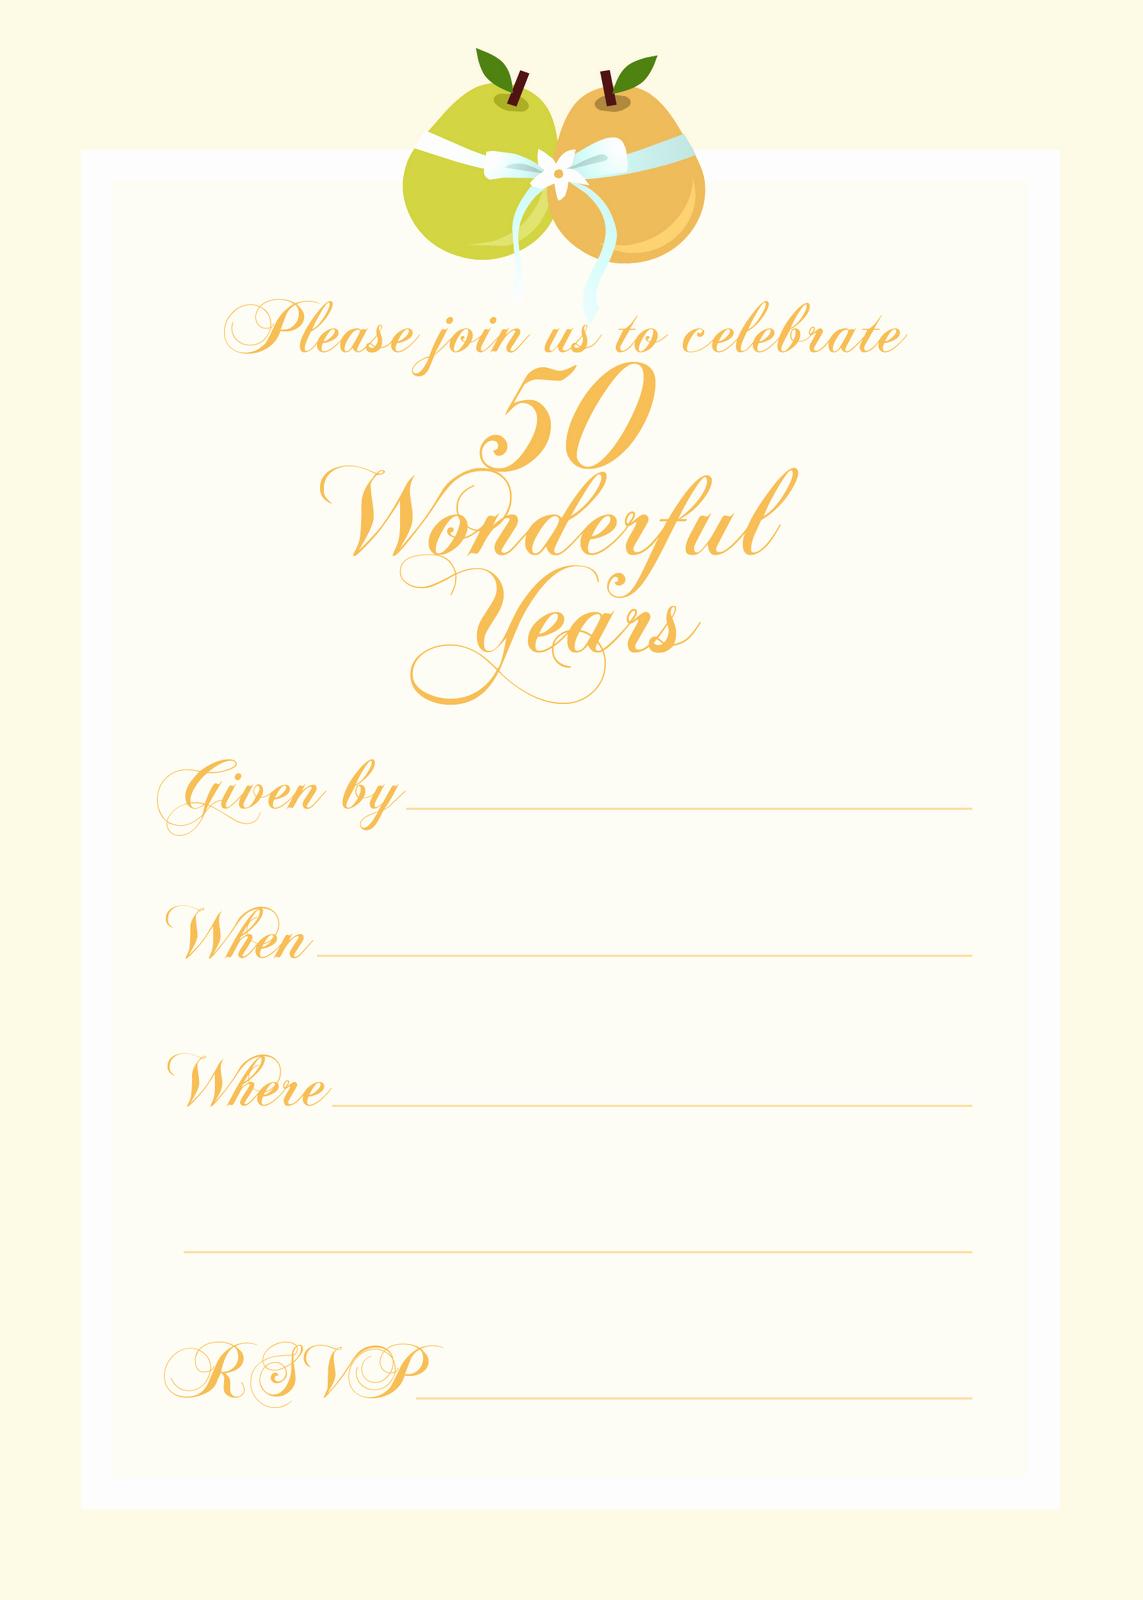 50th Anniversary Invitations Templates Elegant Free Printable 50th Birthday Party Invitation Templates